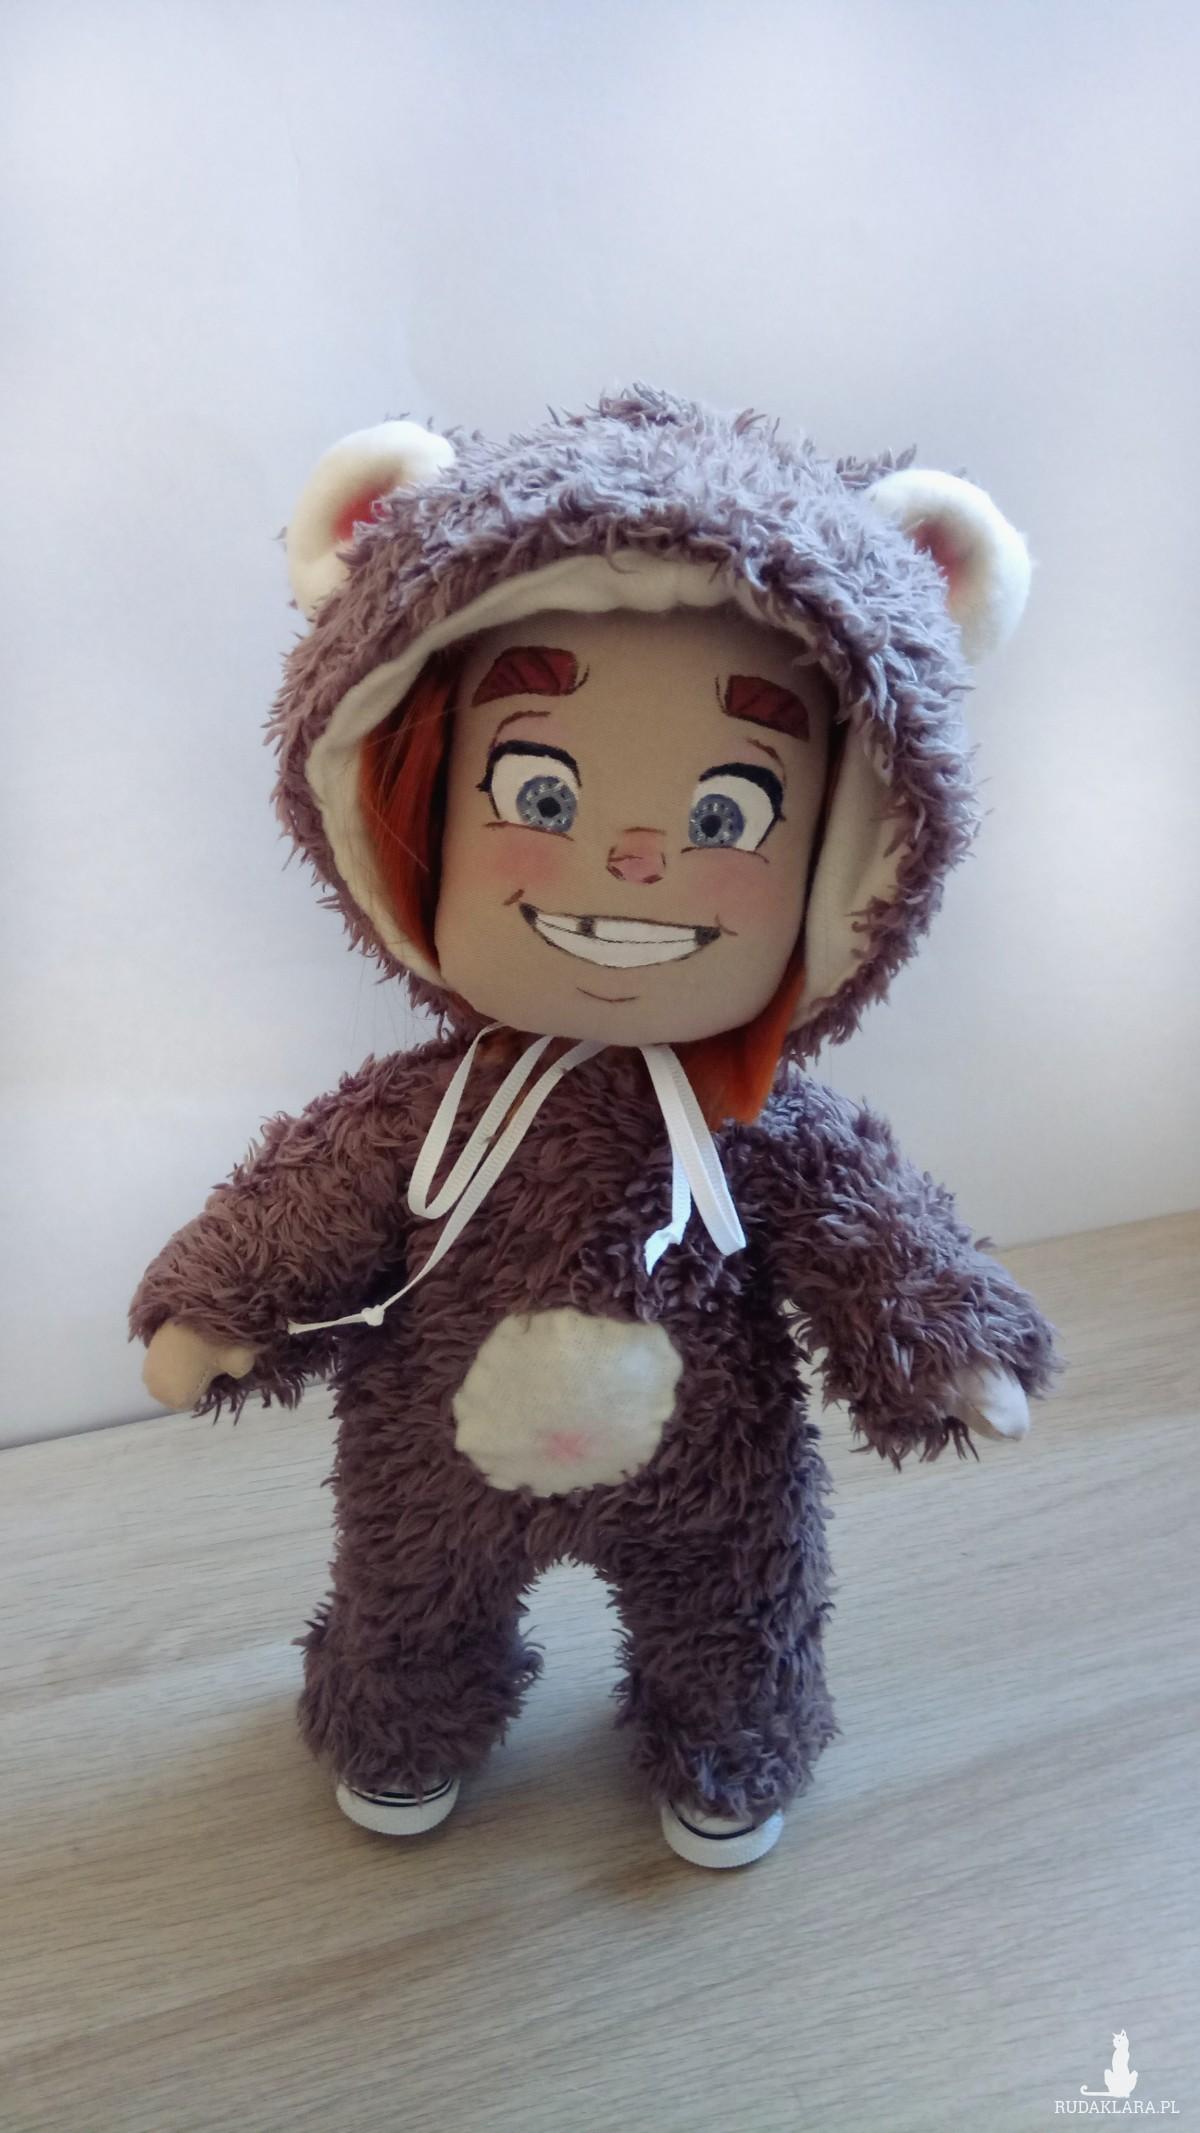 Uśmiechnięta lalka misiu